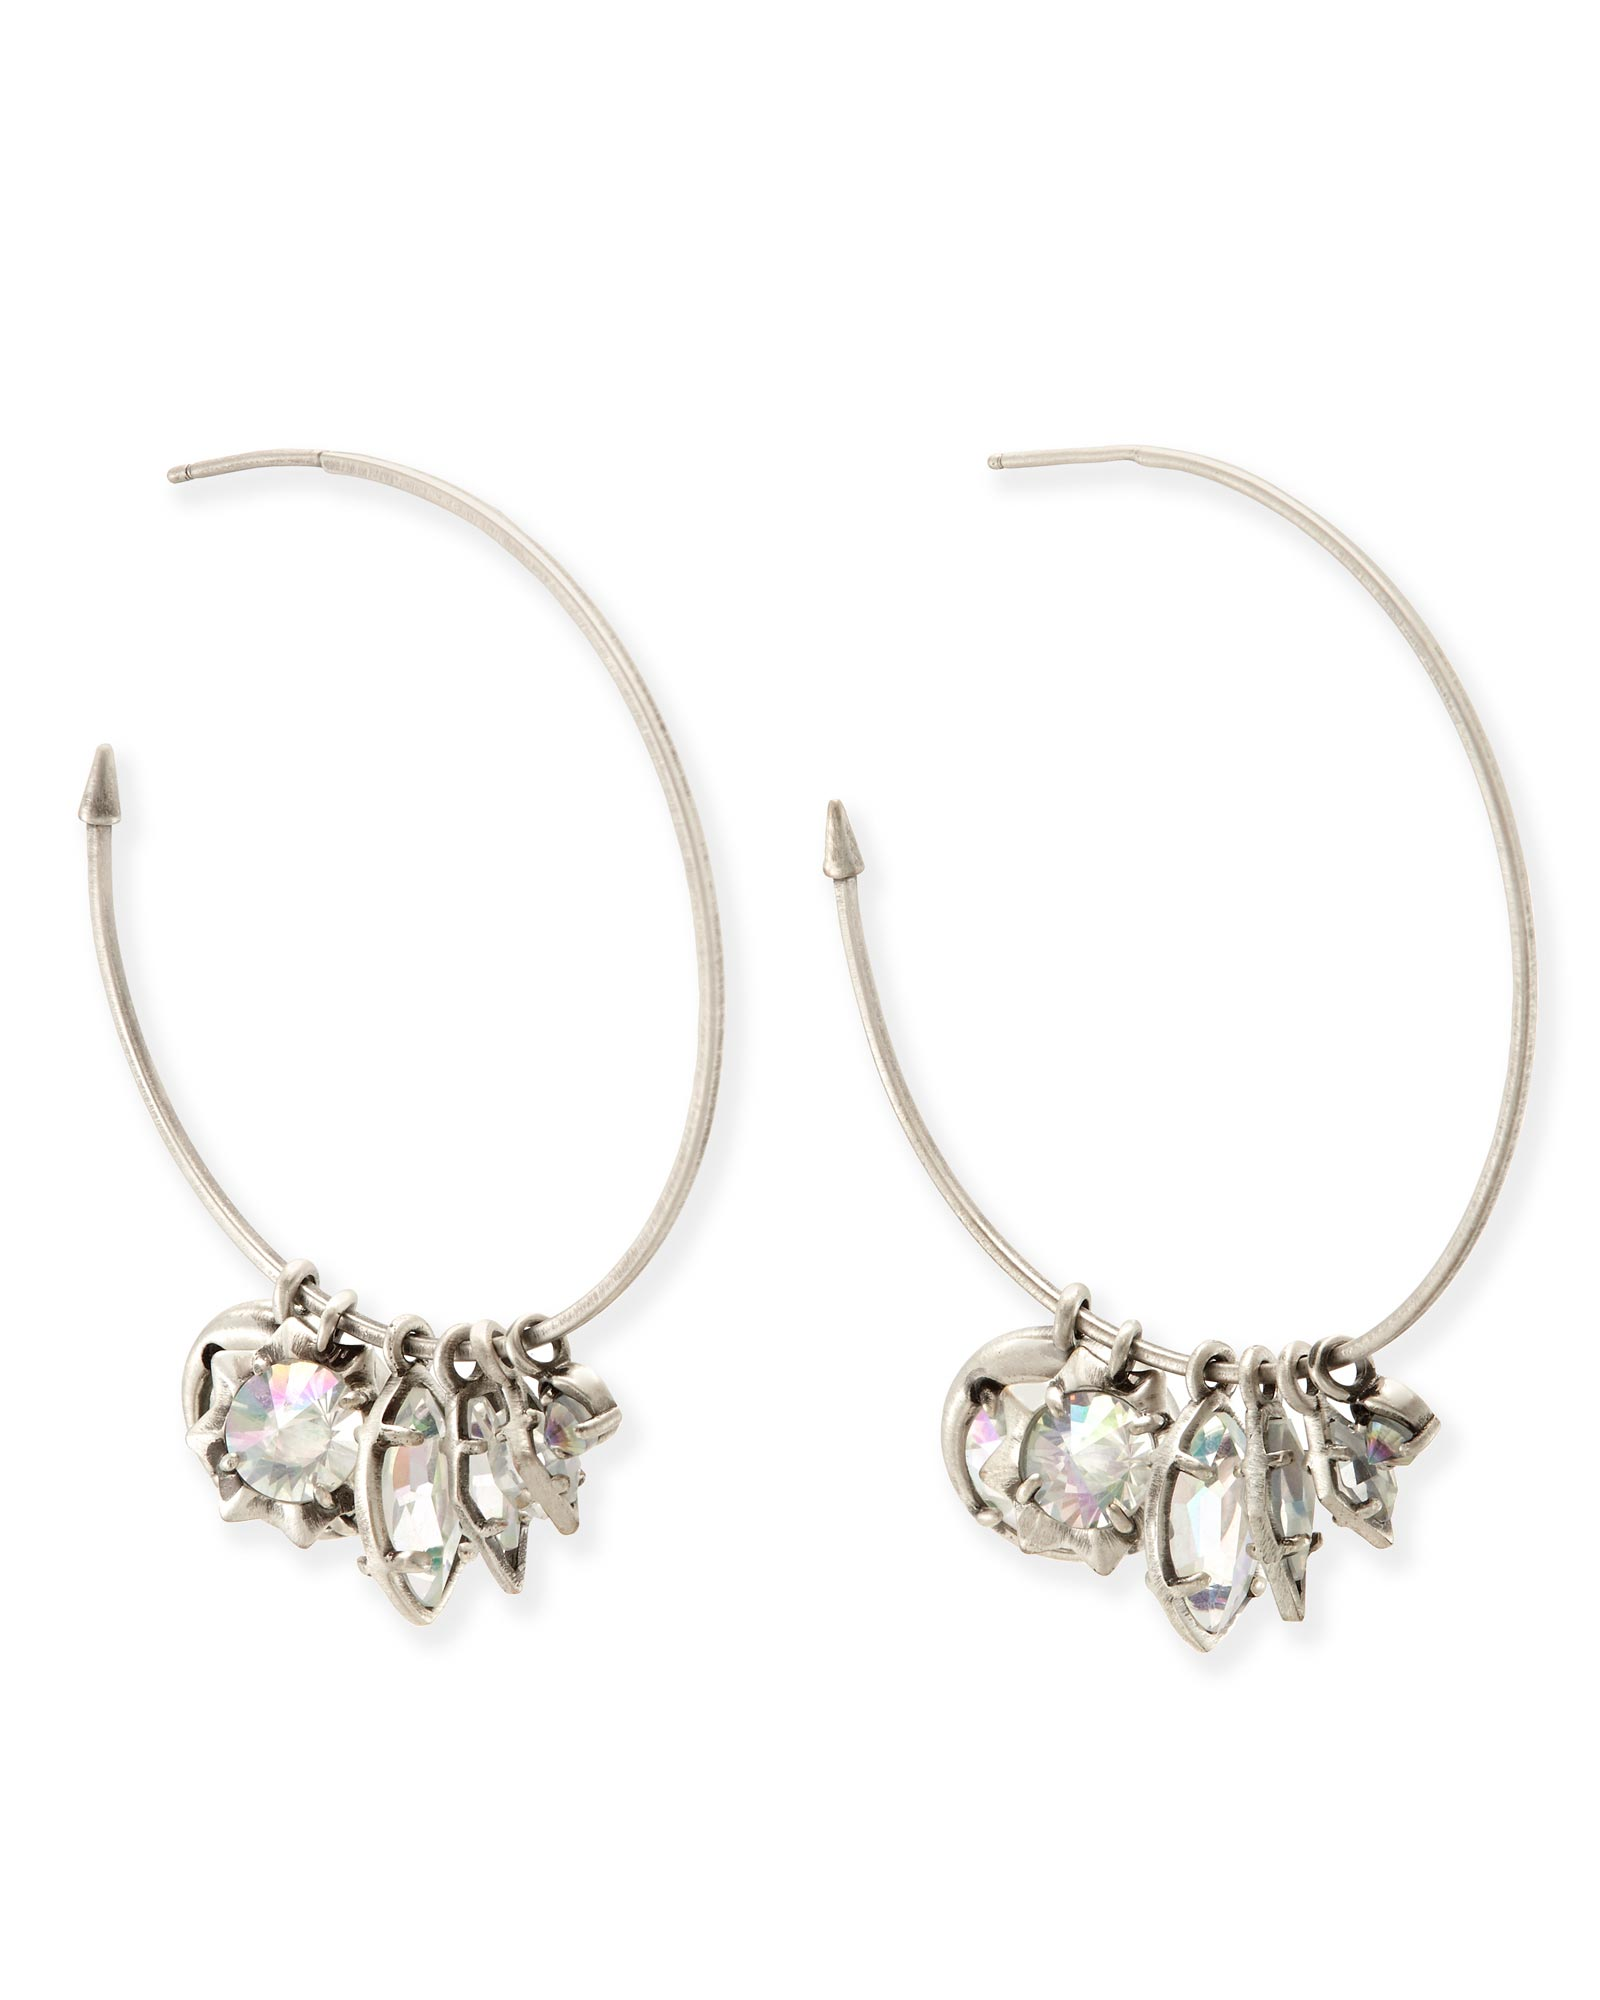 Alyssa Charm Hoop Earrings In Antique Silver